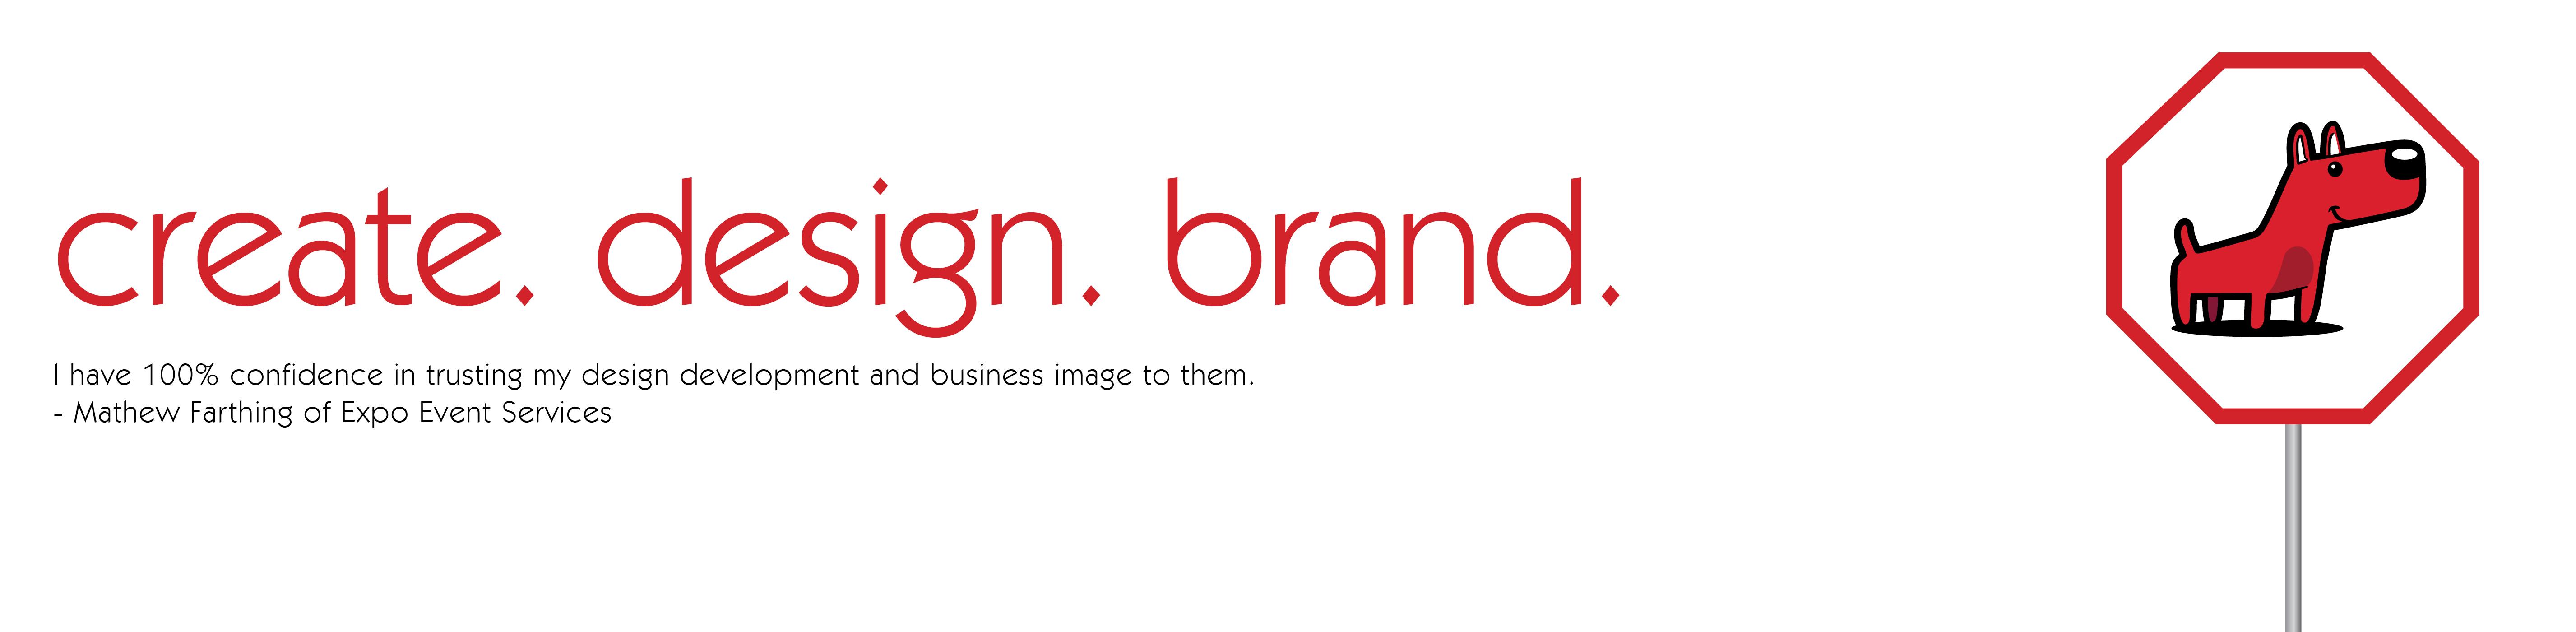 Cteate. Design. Brand